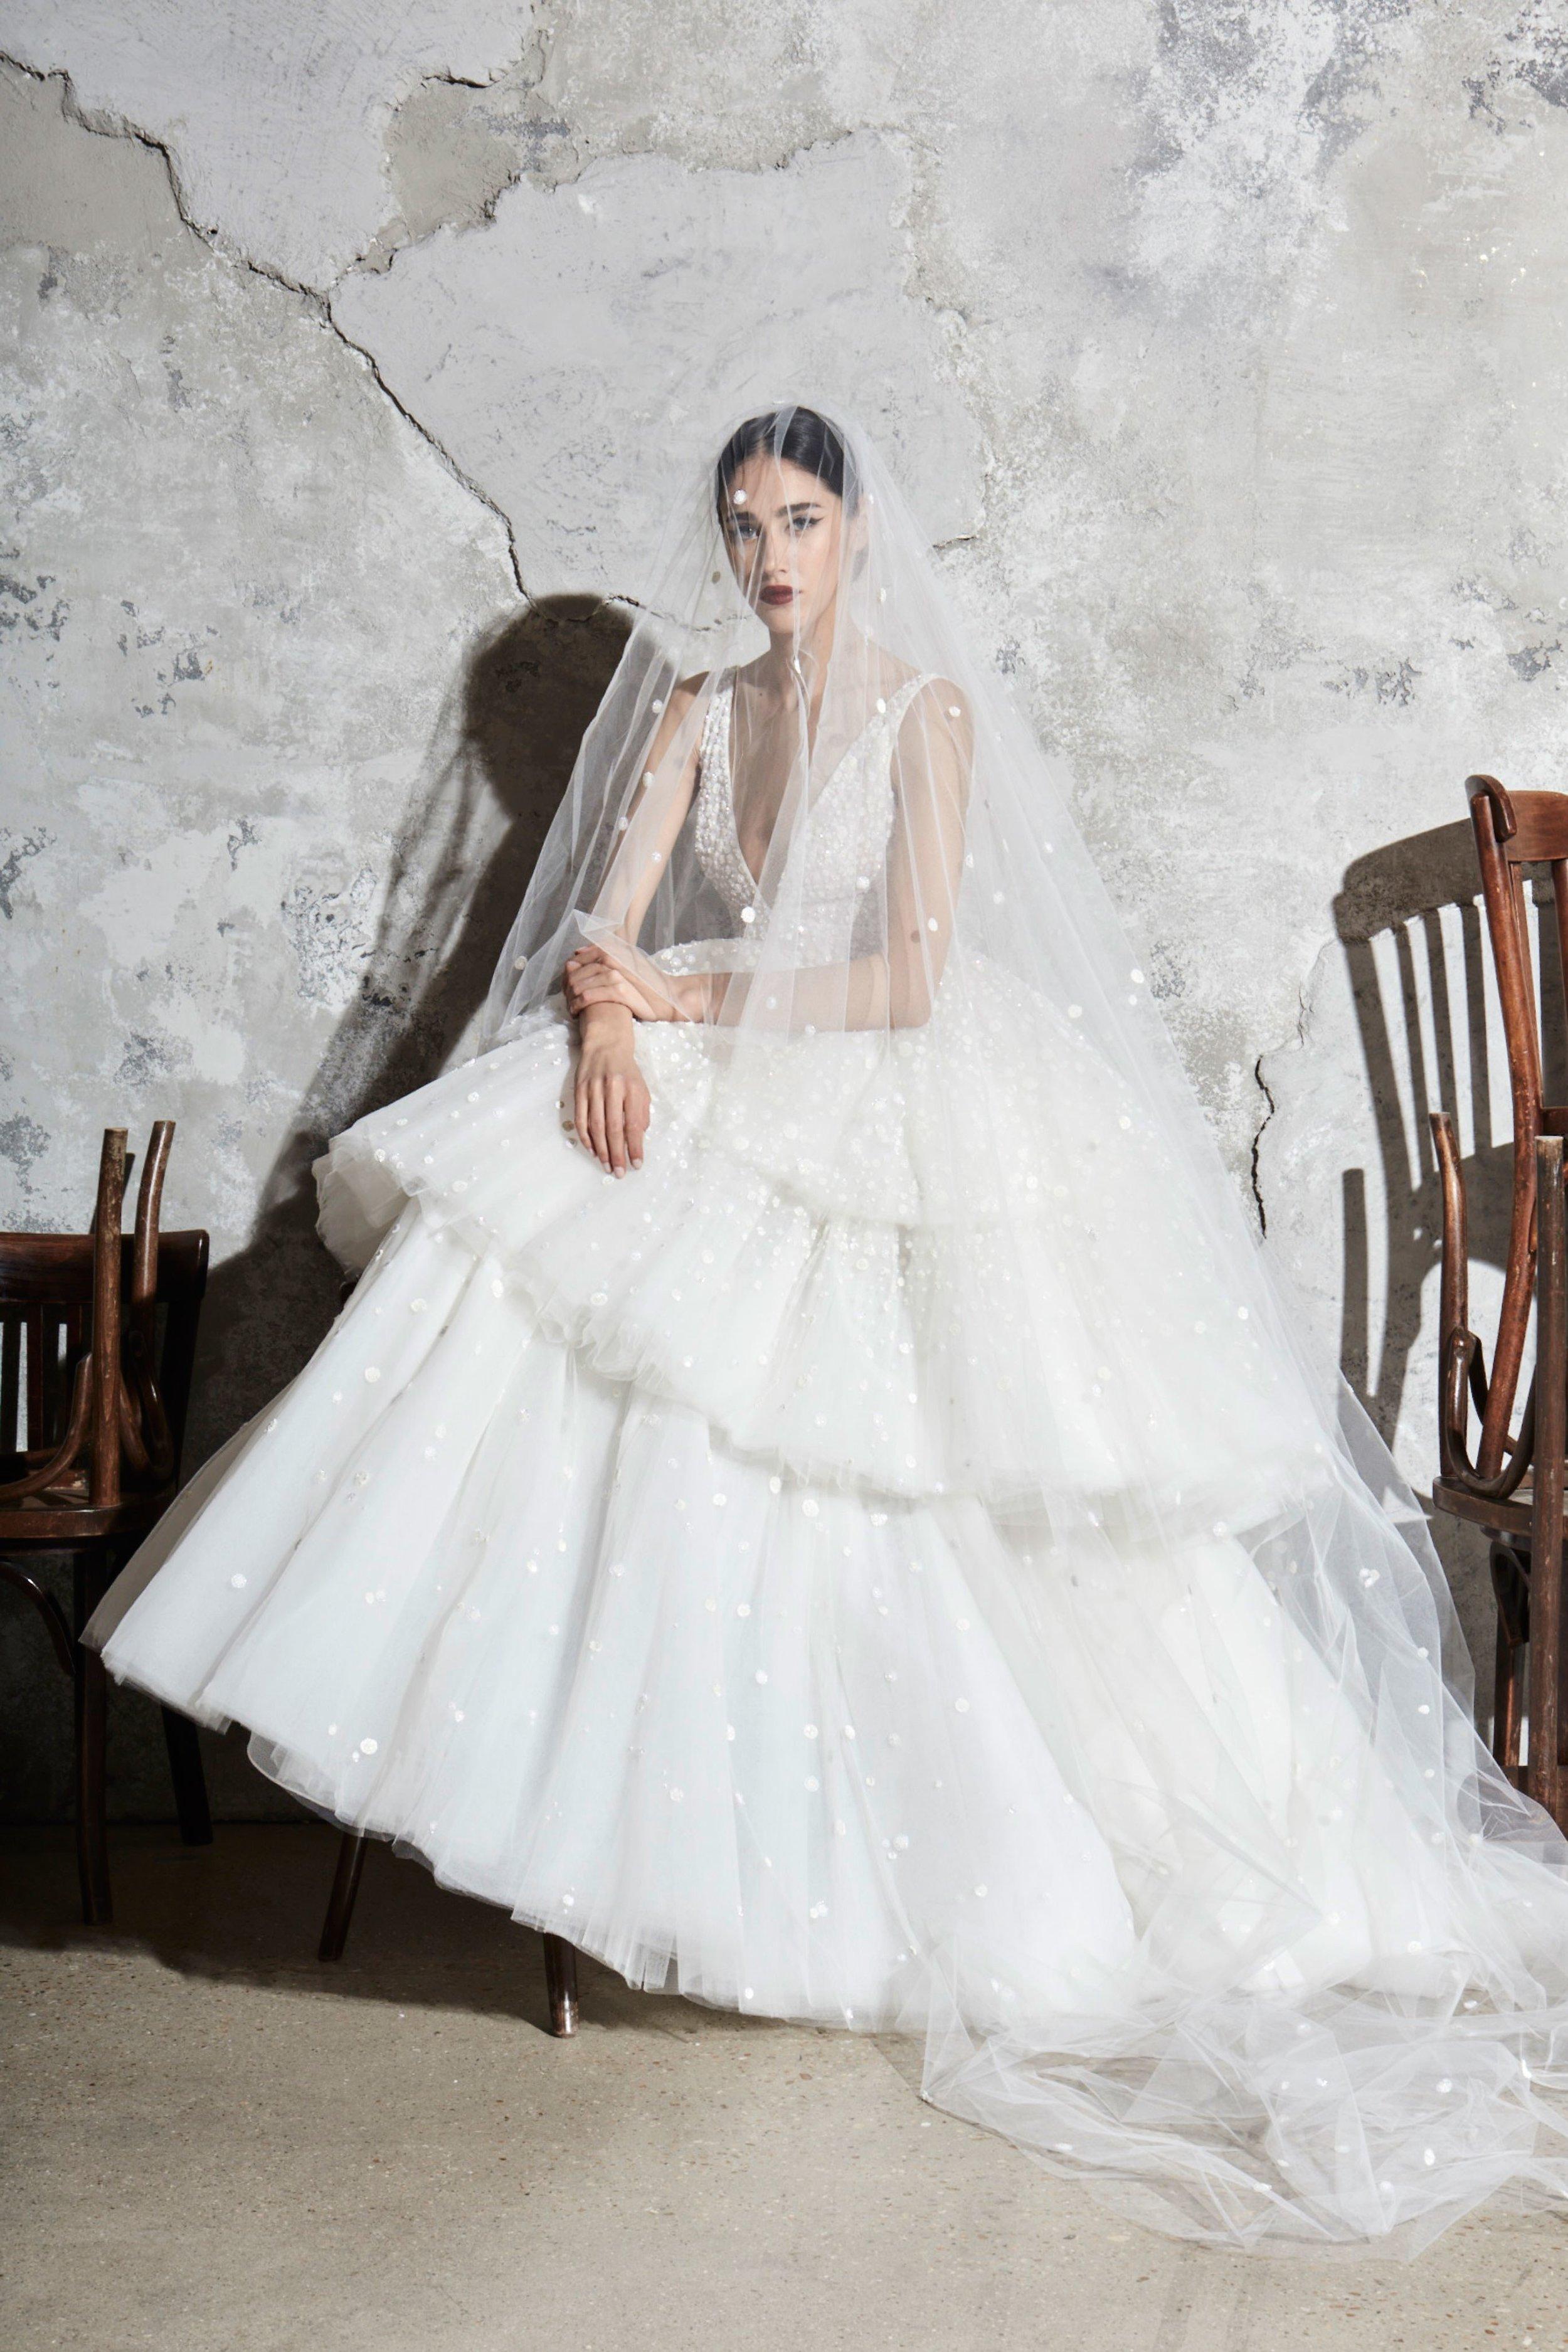 00015-zuhair-murad-new-york-bridal-Spring-2020-CREDIT-Thomas-Nutzl.jpg